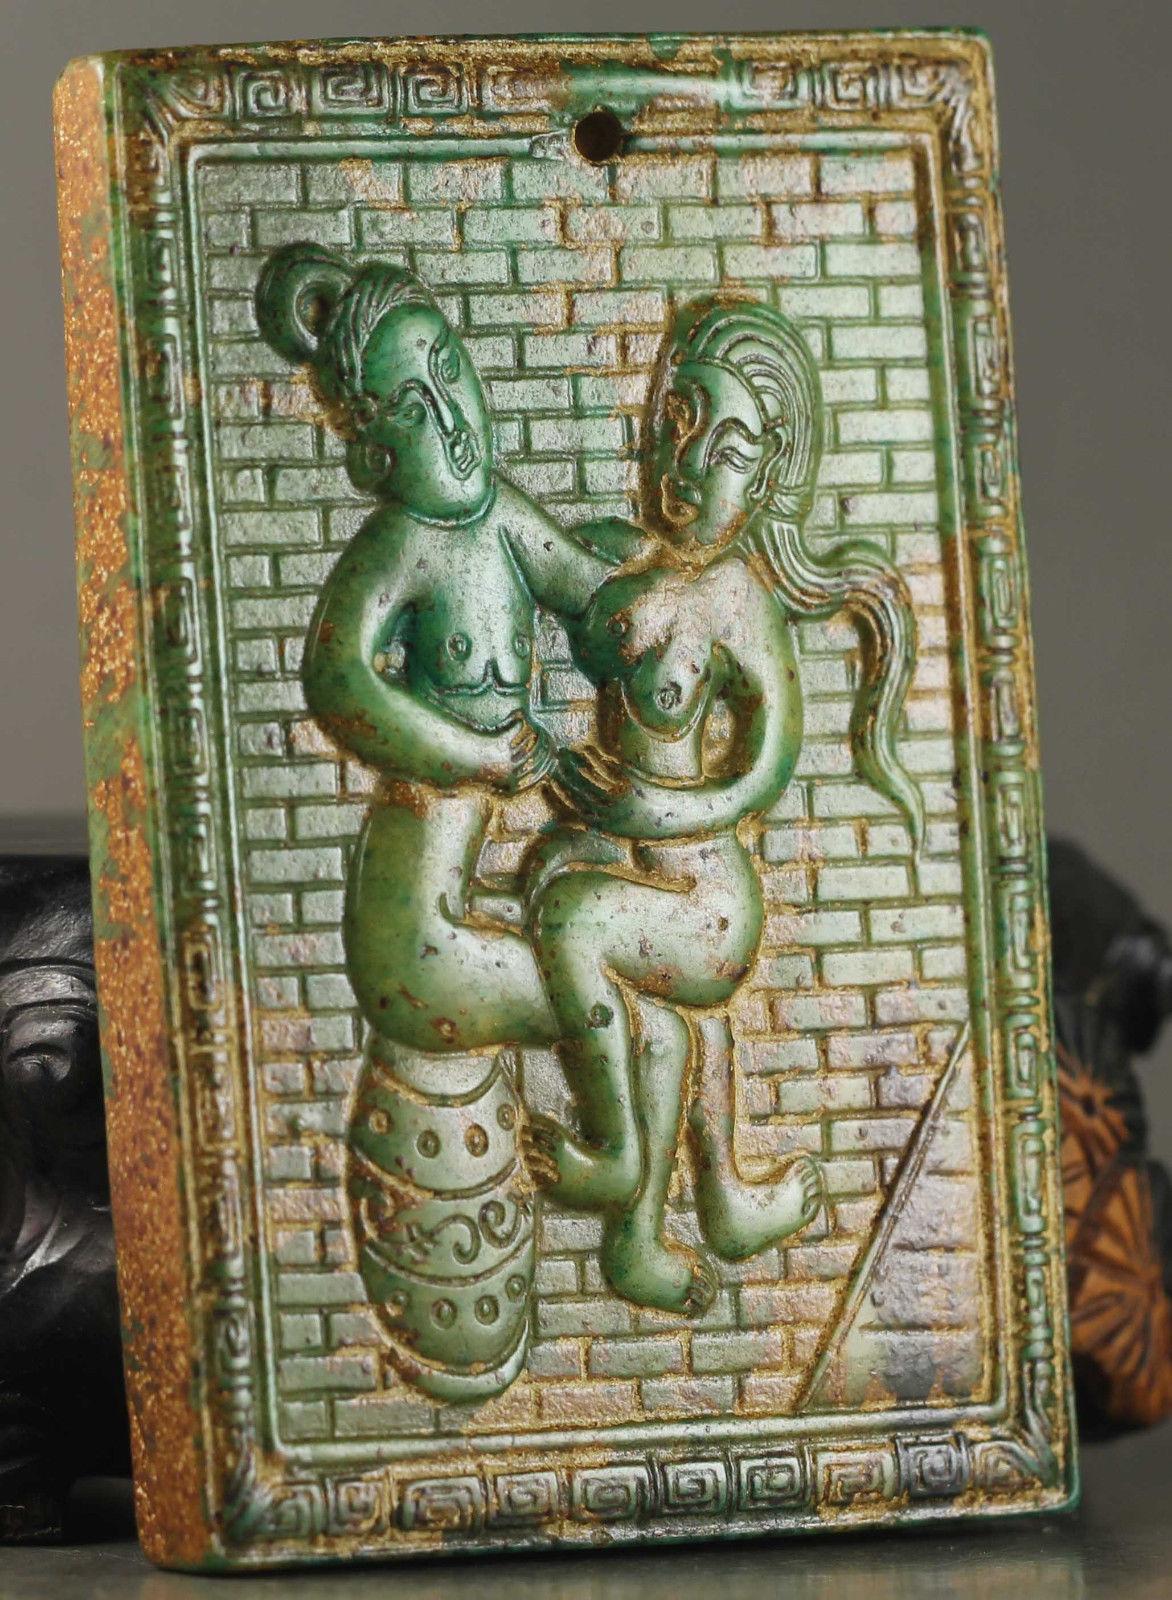 Indian Antique Medallion Pendant 'Man-Woman Act'